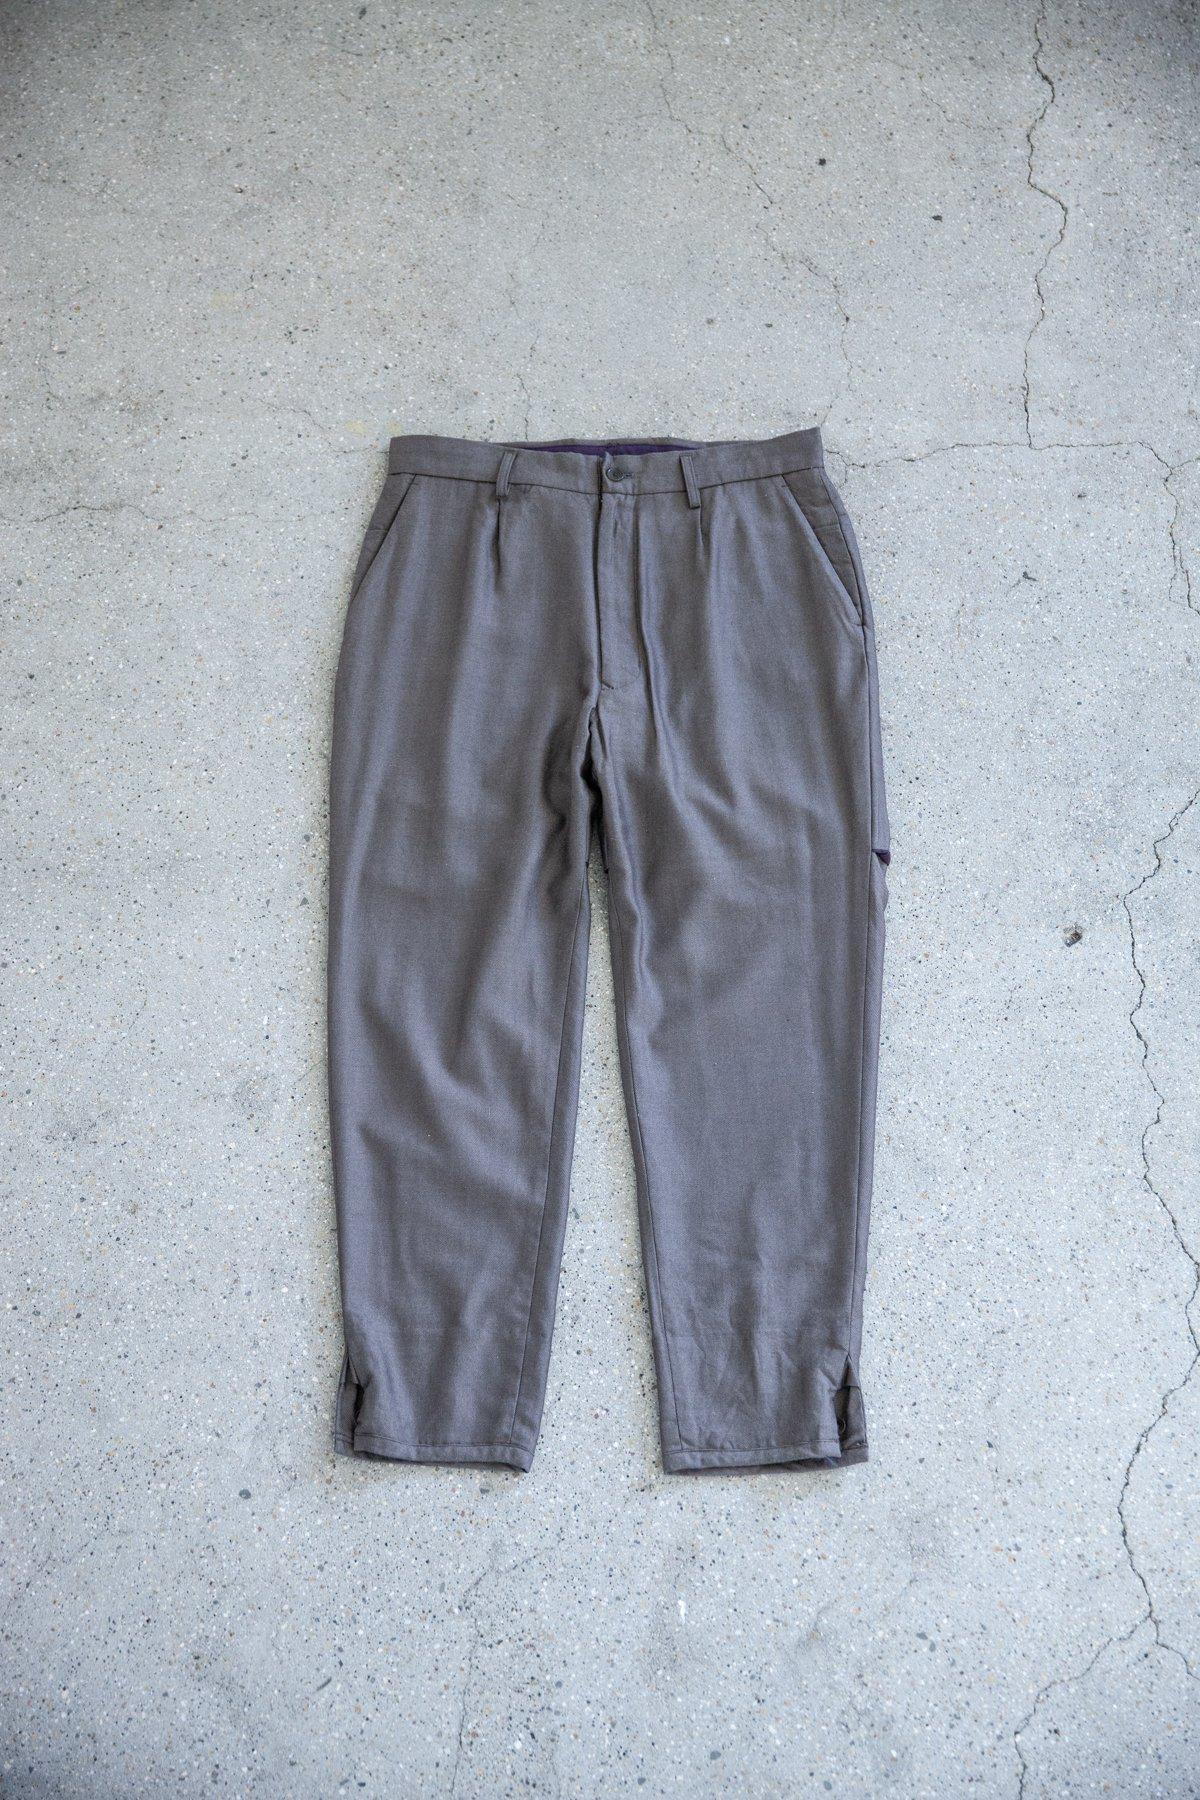 HOMELESS TAILOR / HIP GUSSET PANTS